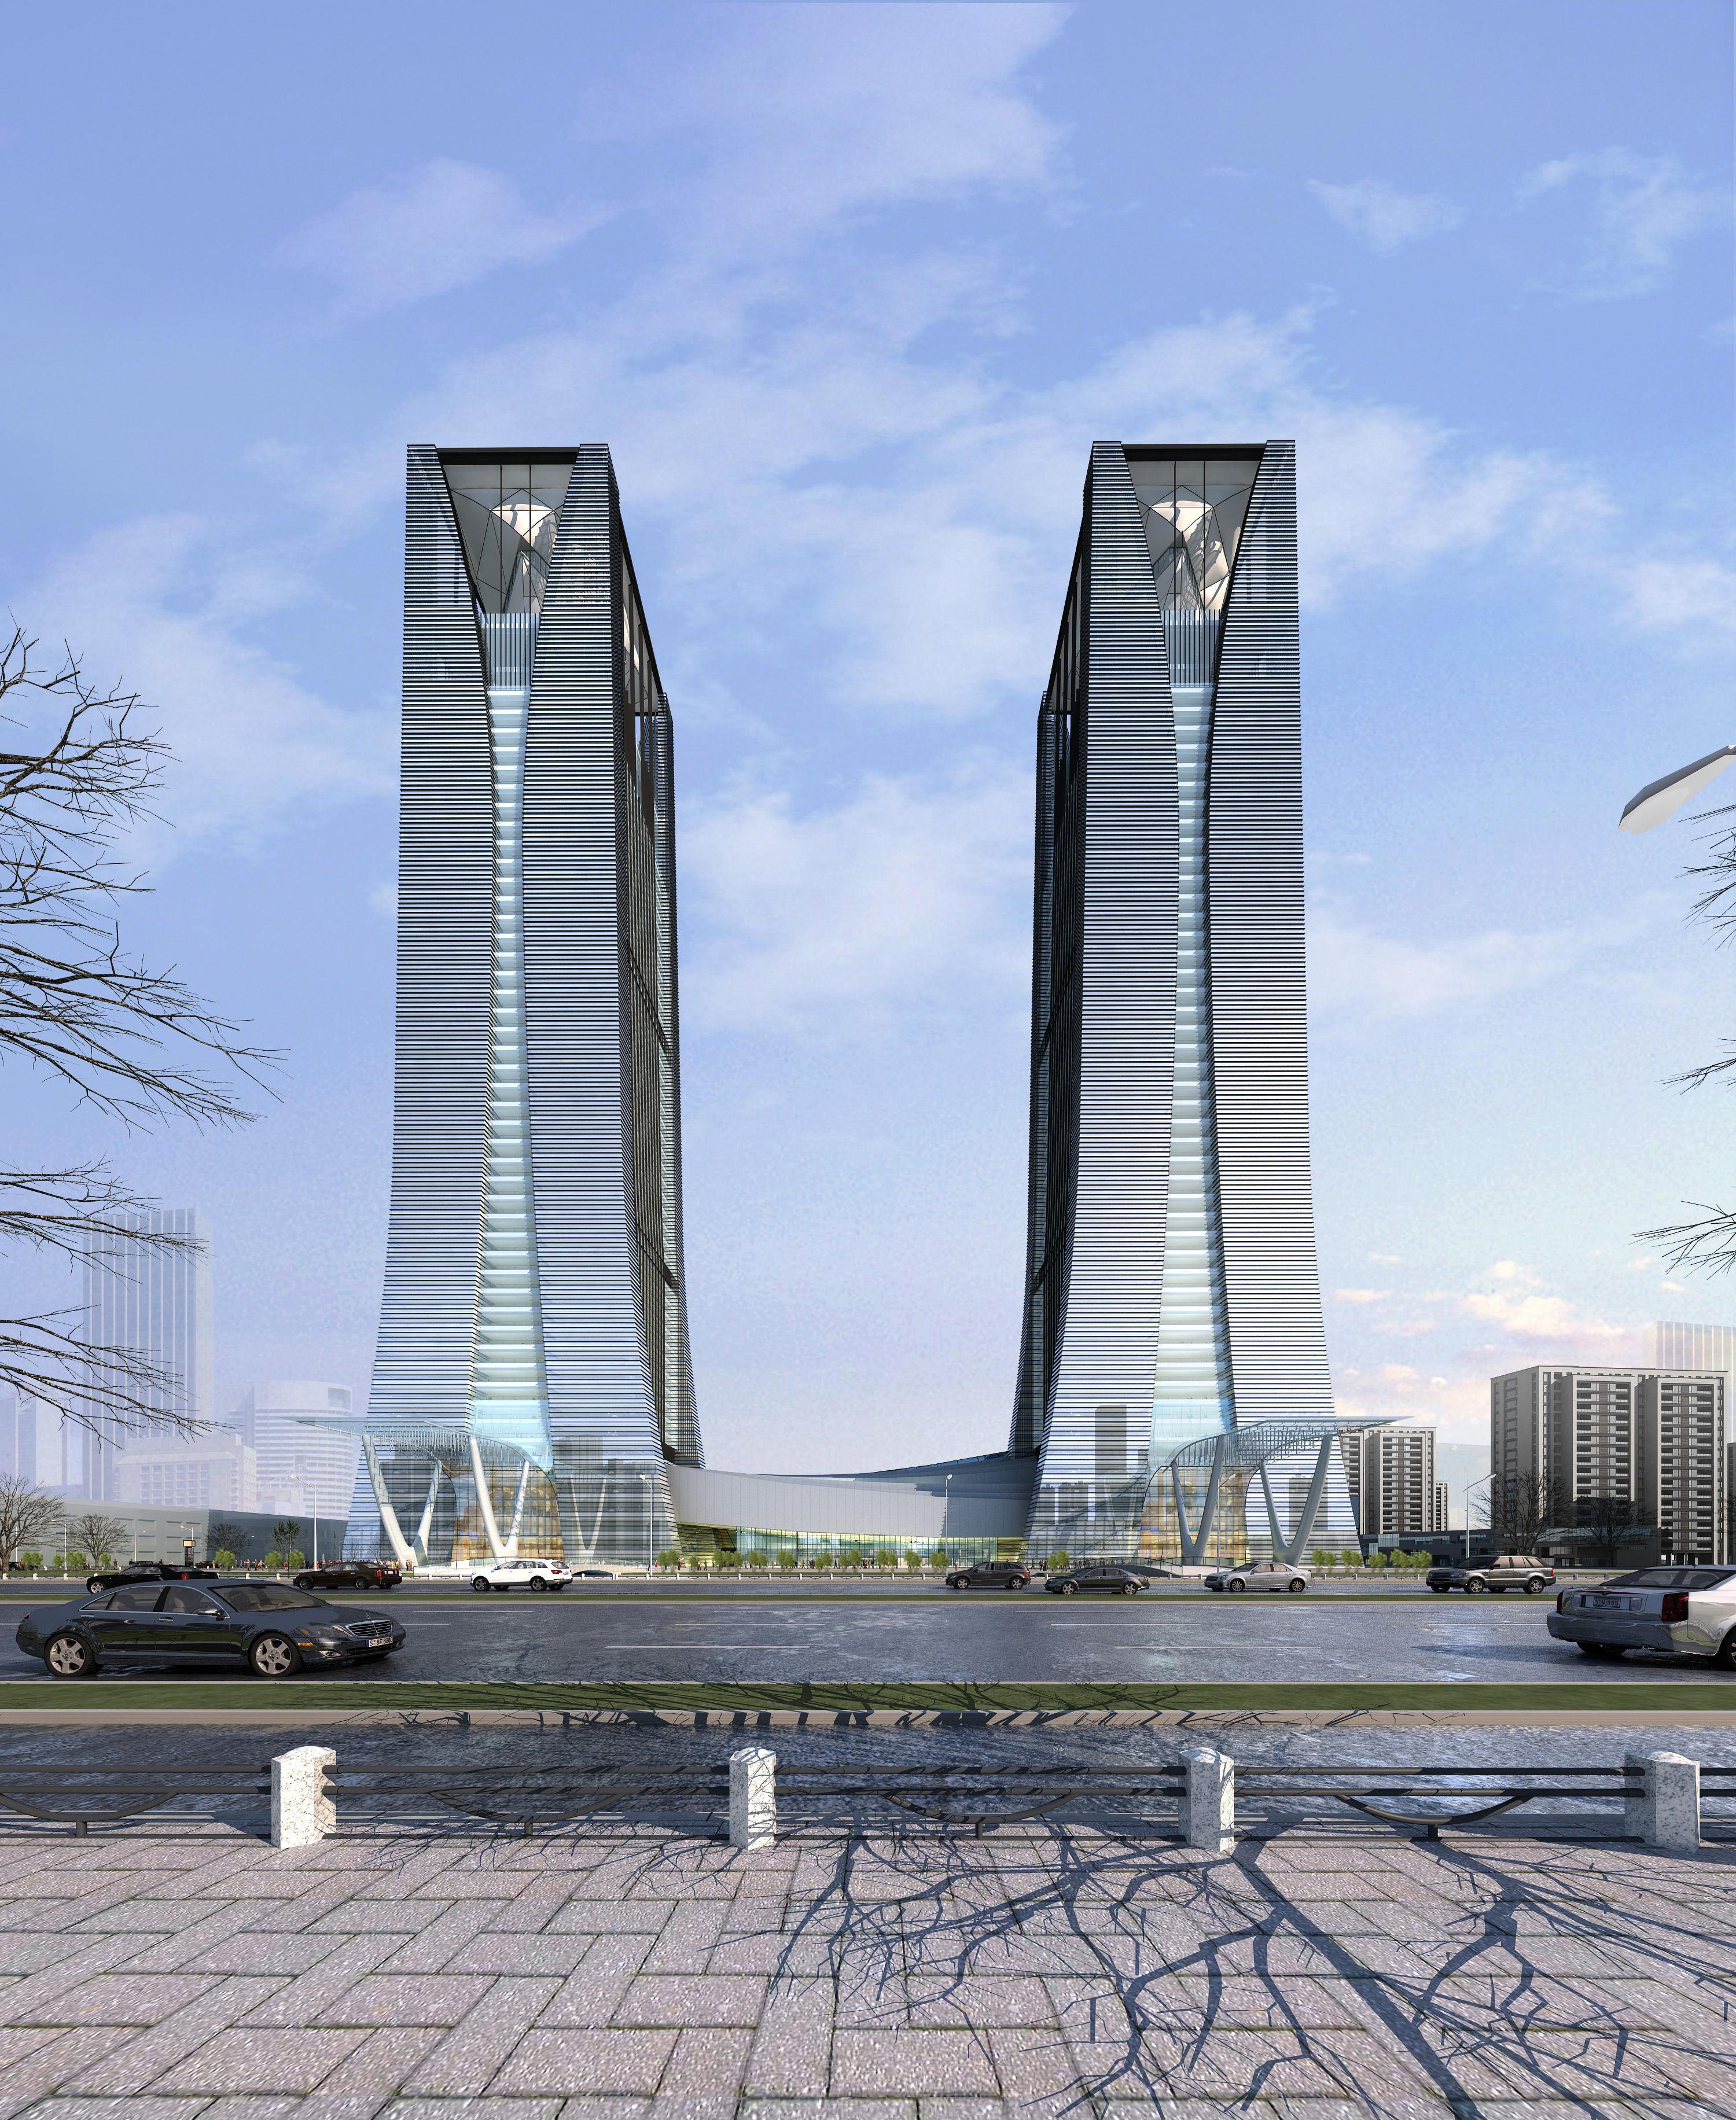 Best Exterior Design App: Exterior Office Building Scene 005 3D